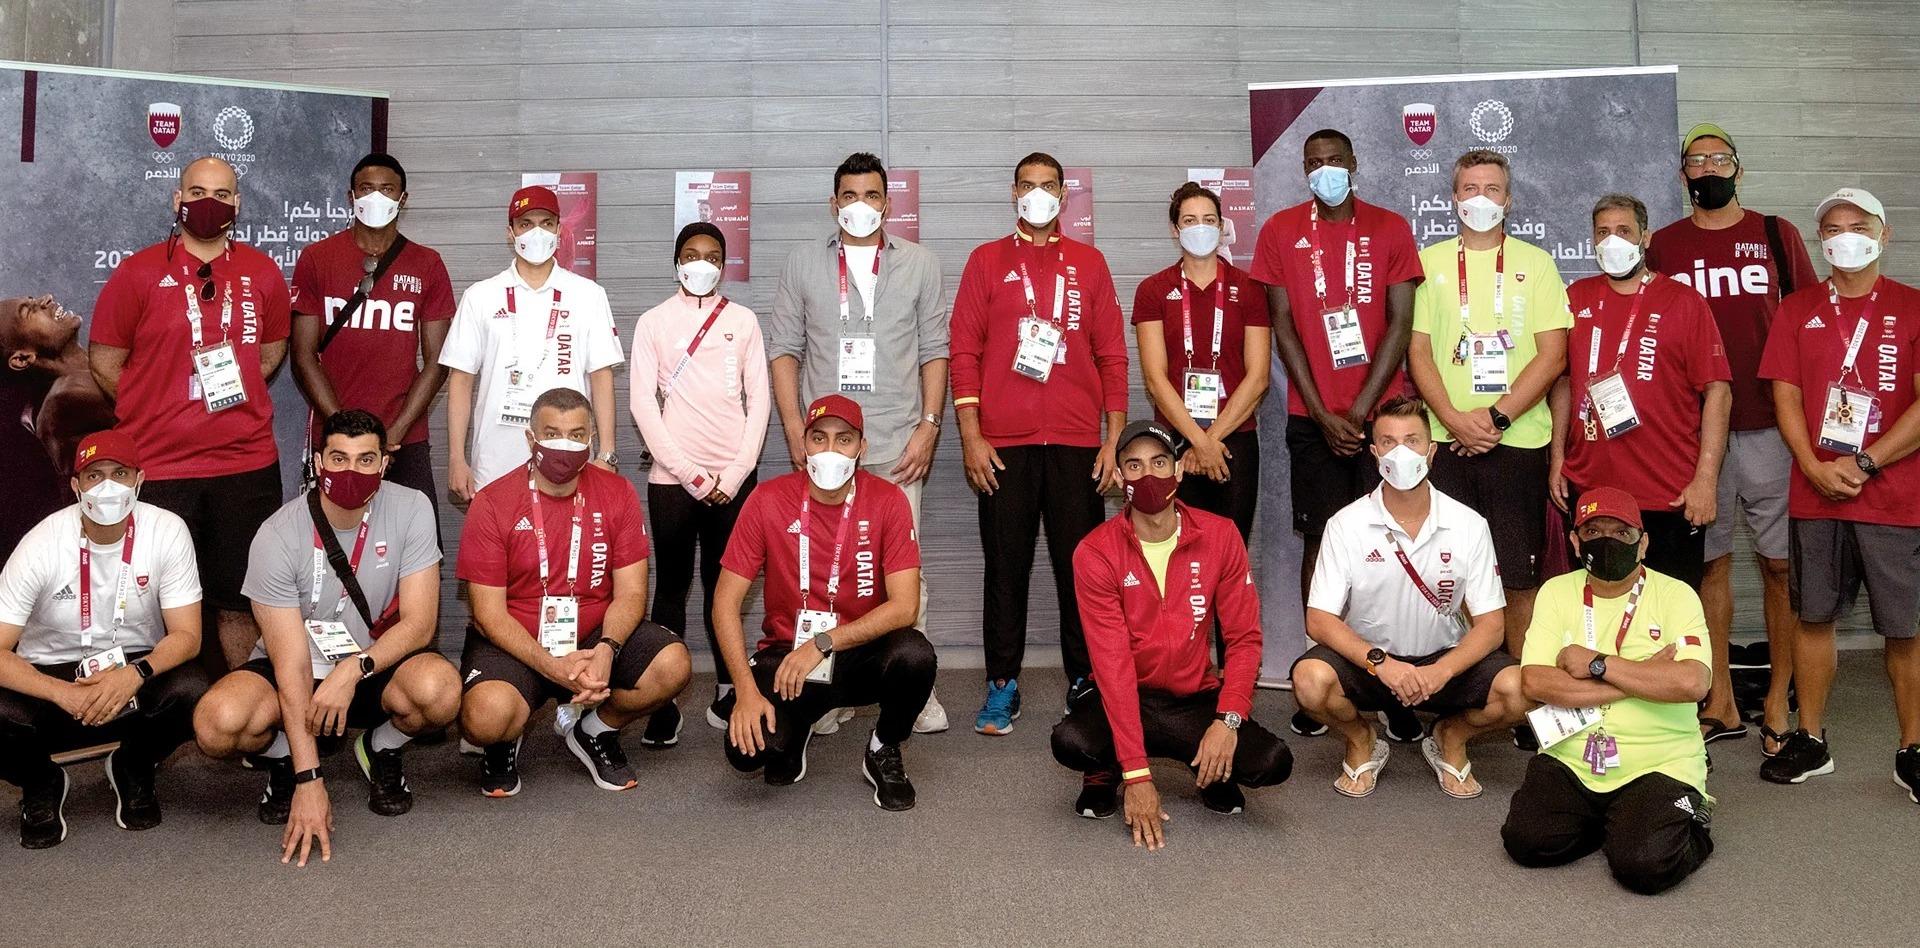 Sheikh Joaan Visits Qatari Delegation of Tokyo 2020 Olympics